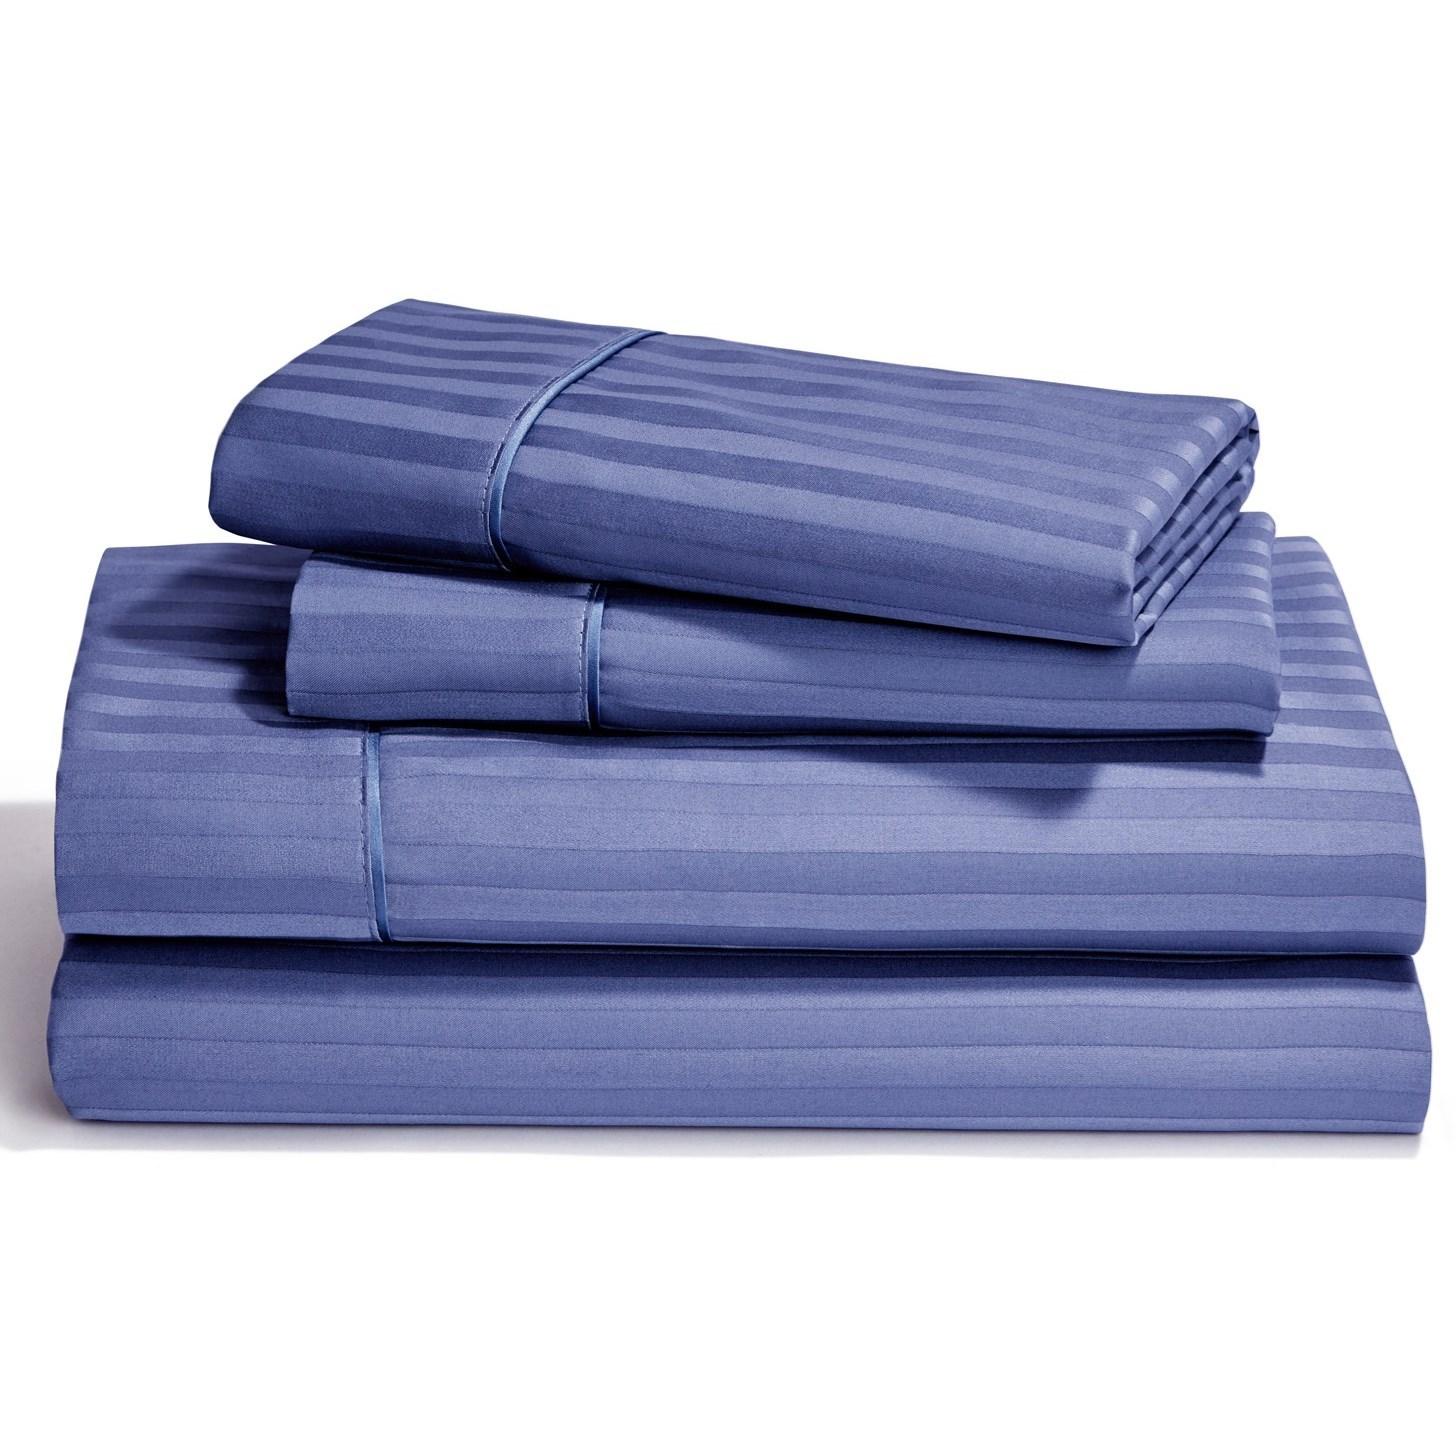 Egyptian Cotton Sheet Sets Twin XL Denim Flat Sheet Set by Tempur-Pedic® at Sparks HomeStore